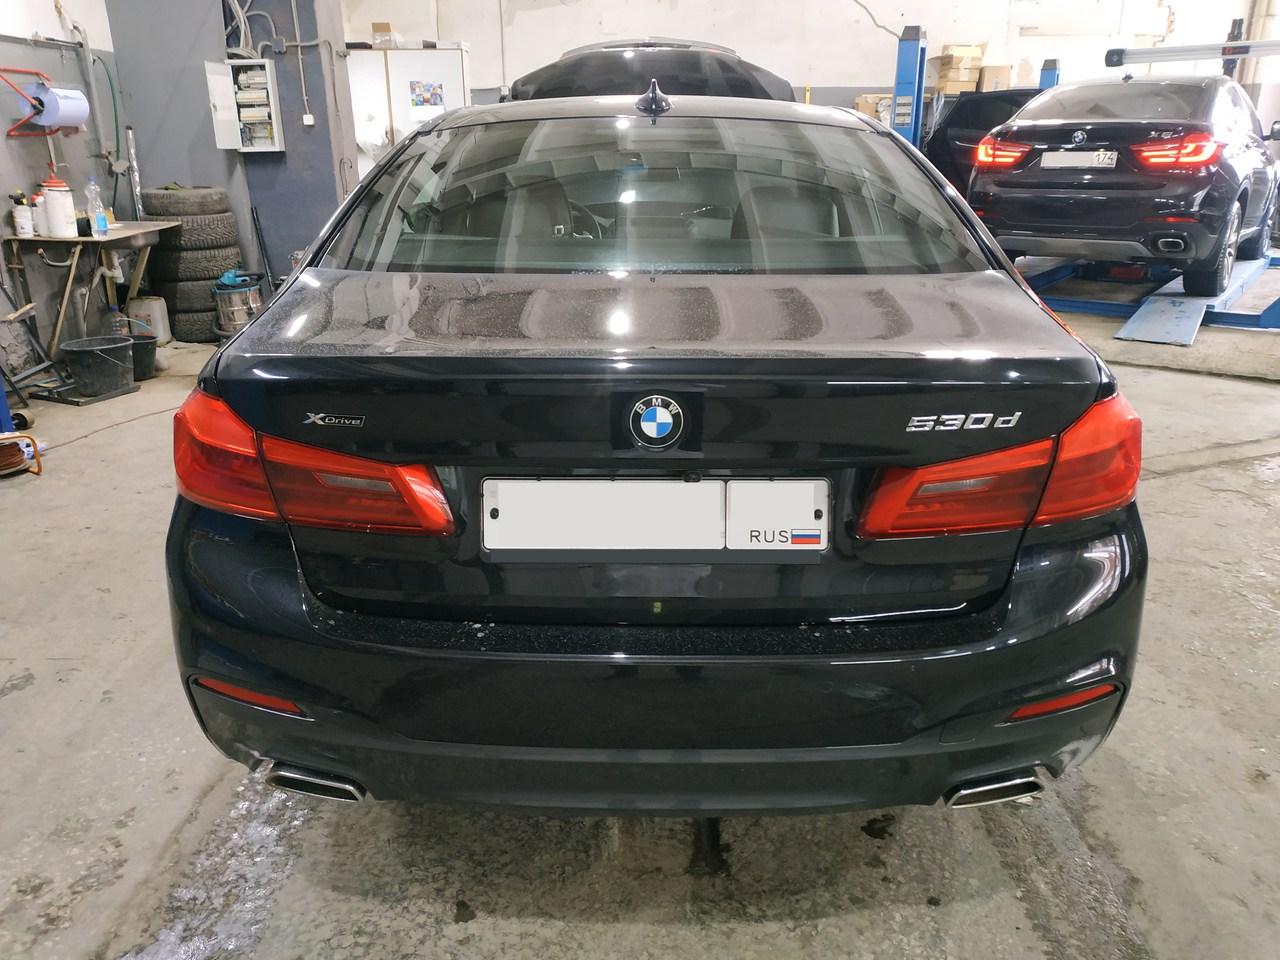 BMW G30 530d 2020 г.в.BMW G30 530d 2020 г.в.